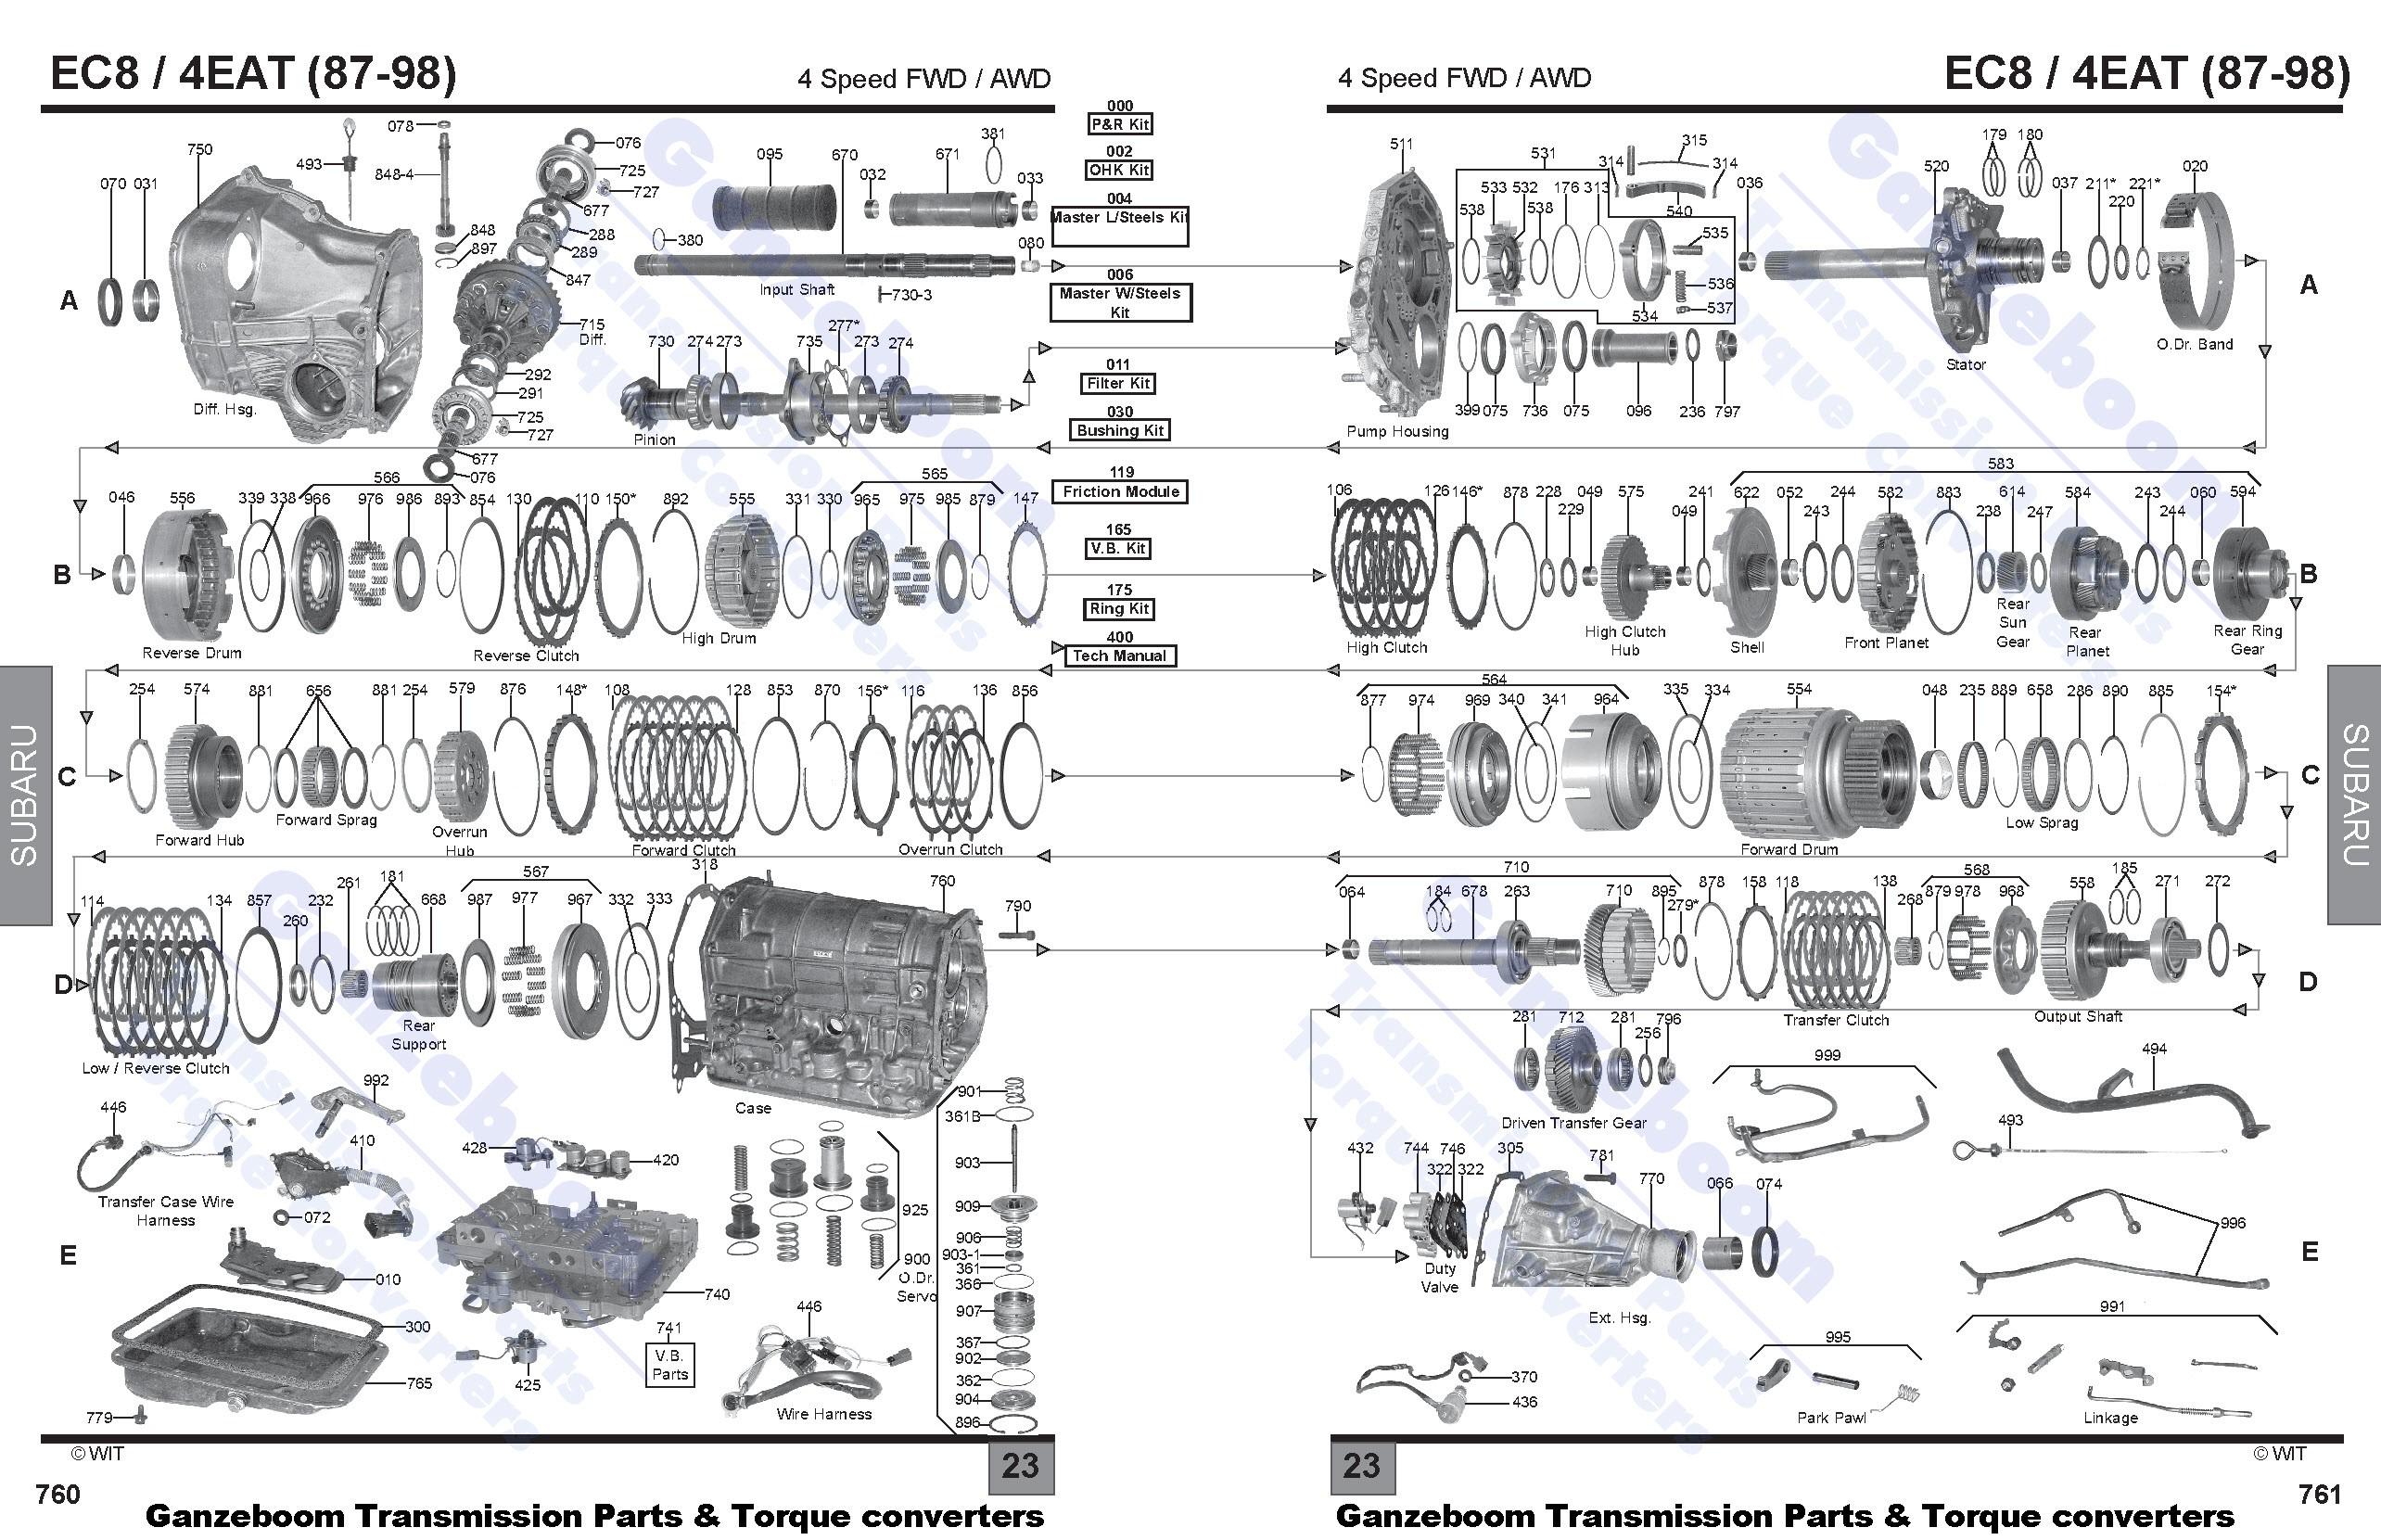 r4ax-el (87-98) 4 speed with band - subaru - parts ... subaru automatic transmission diagram jeep wrangler automatic transmission diagram